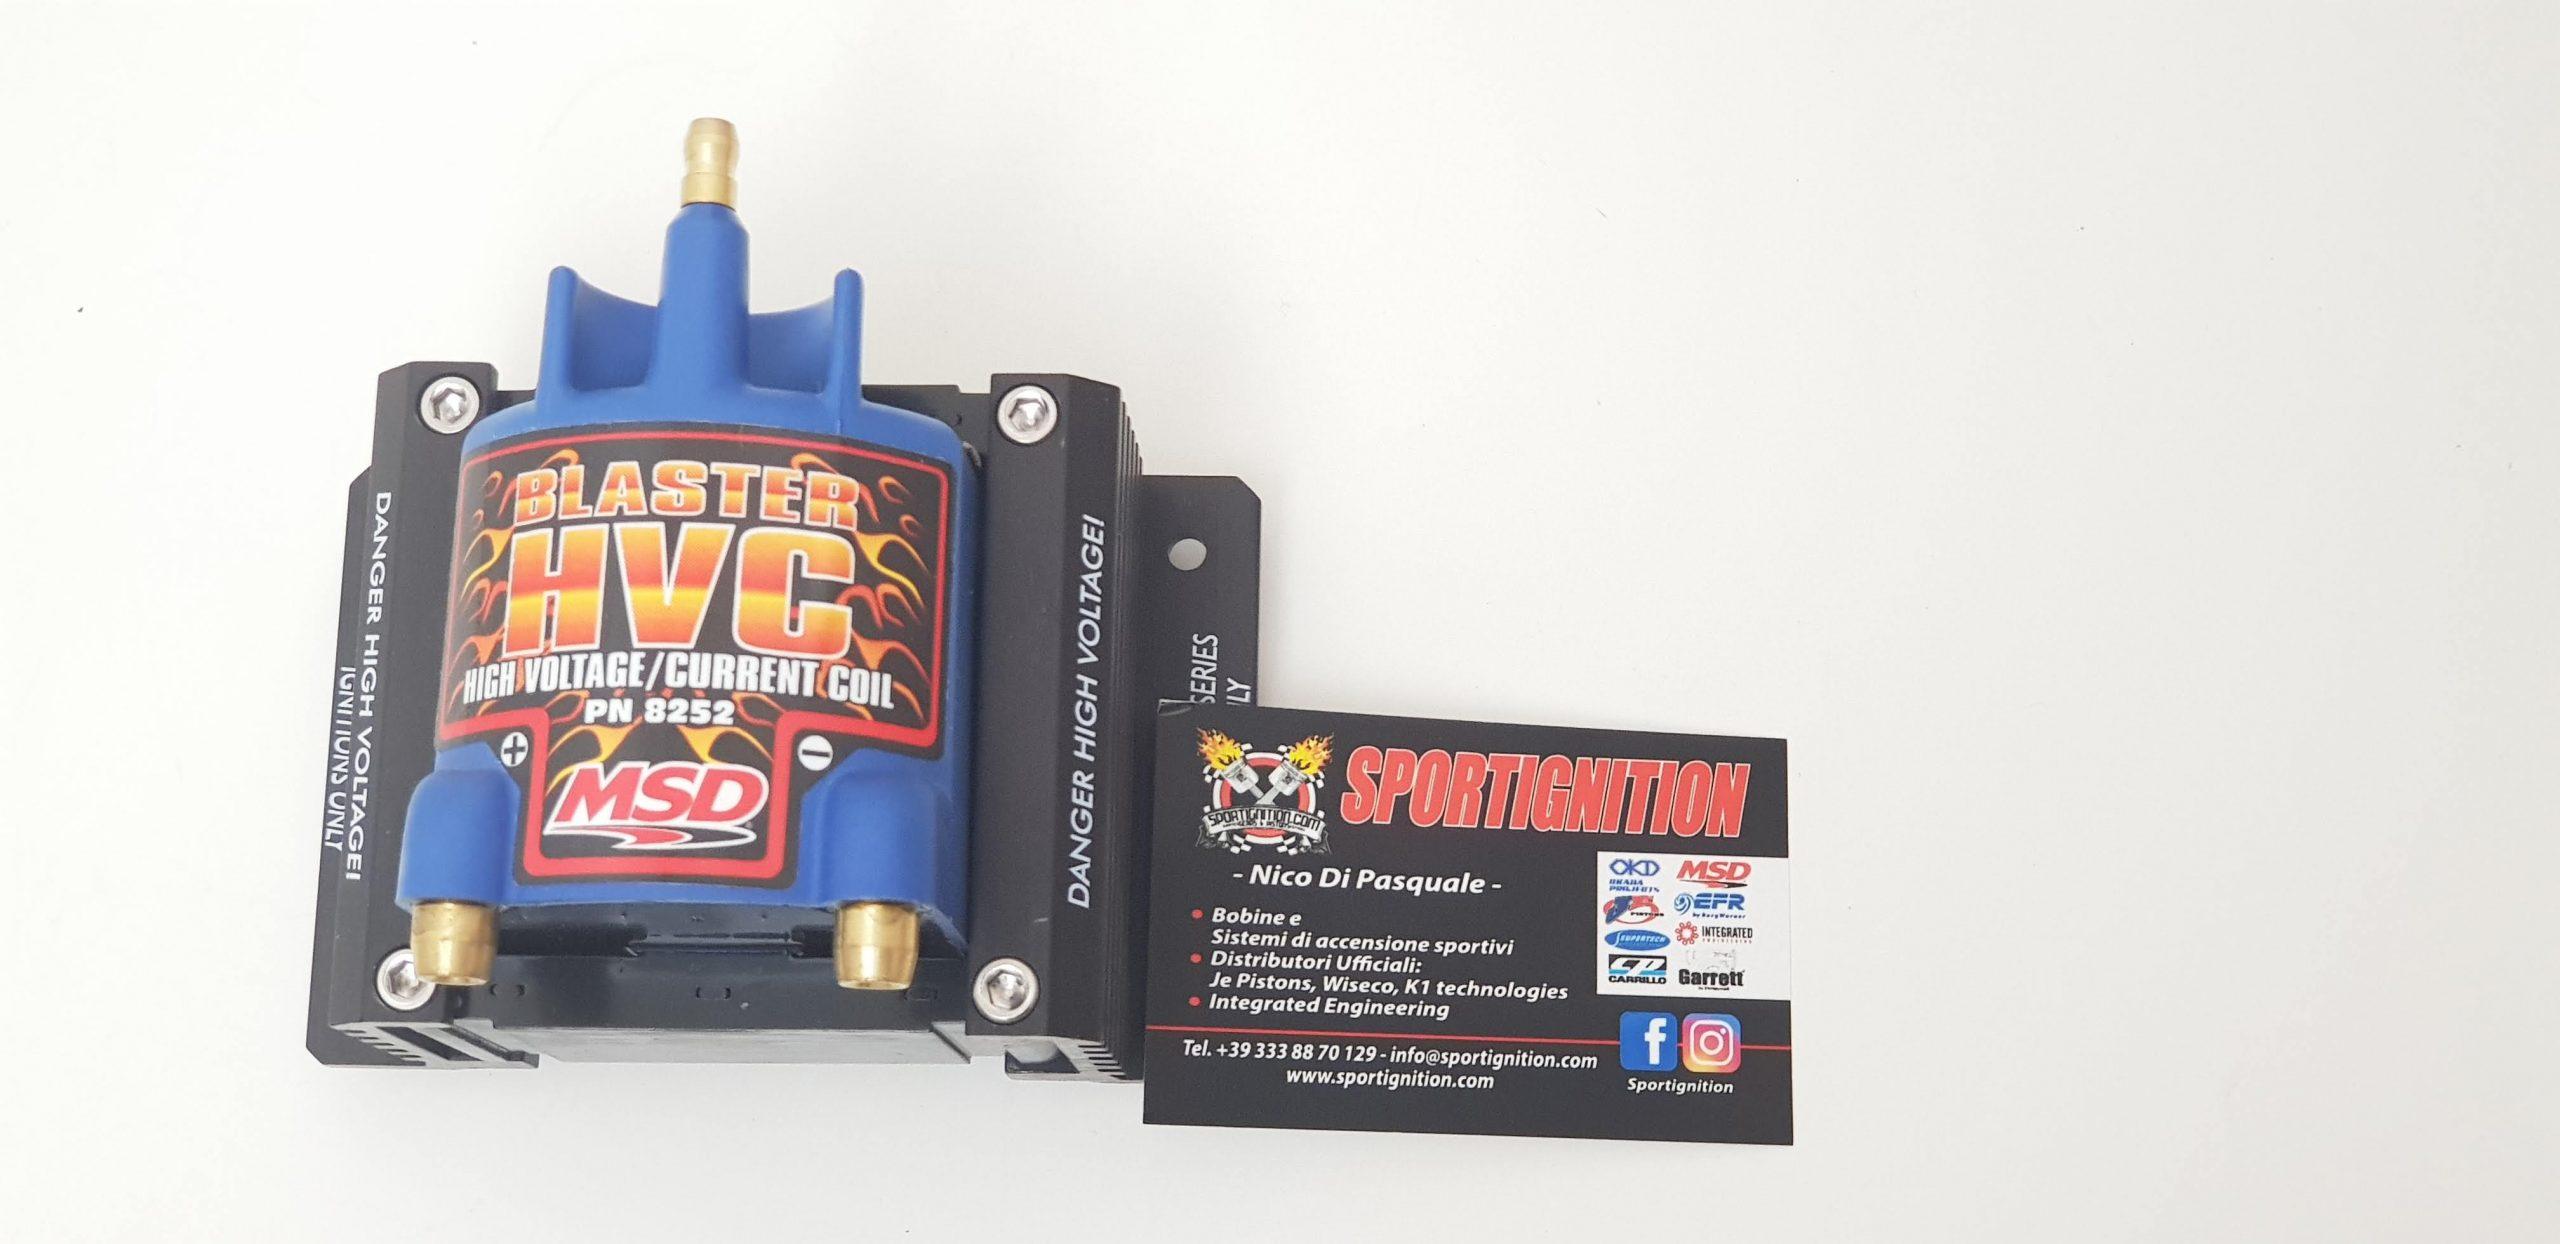 22-Msd Super coil 8252 Ignition